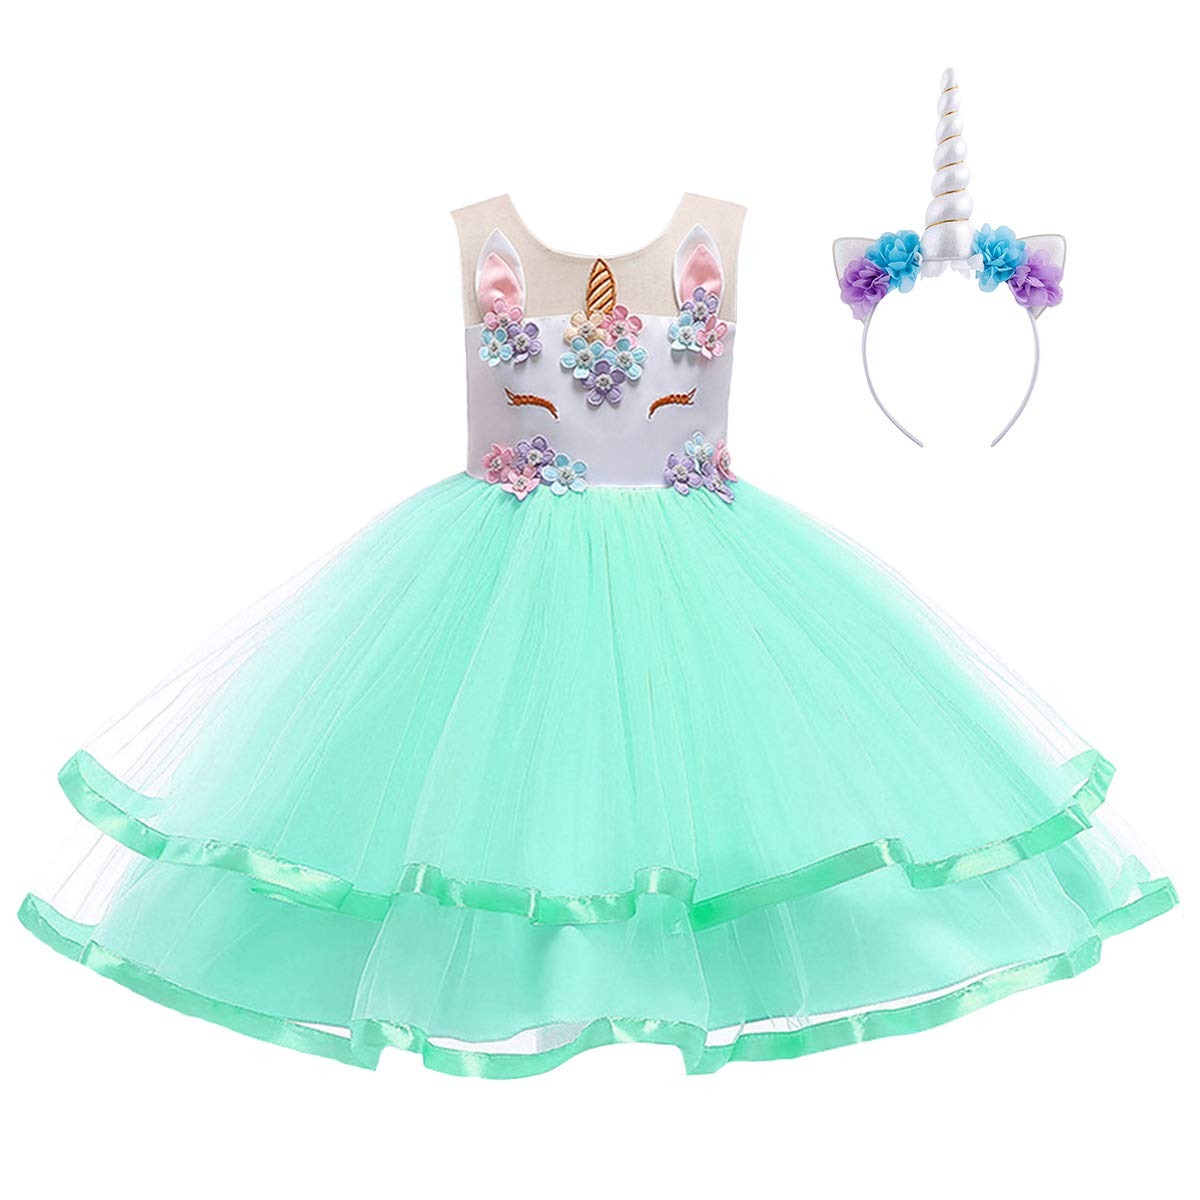 Girls Unicorn Dress Horn Hairband Fancy Dress Costume Book Day Toddlers Babies